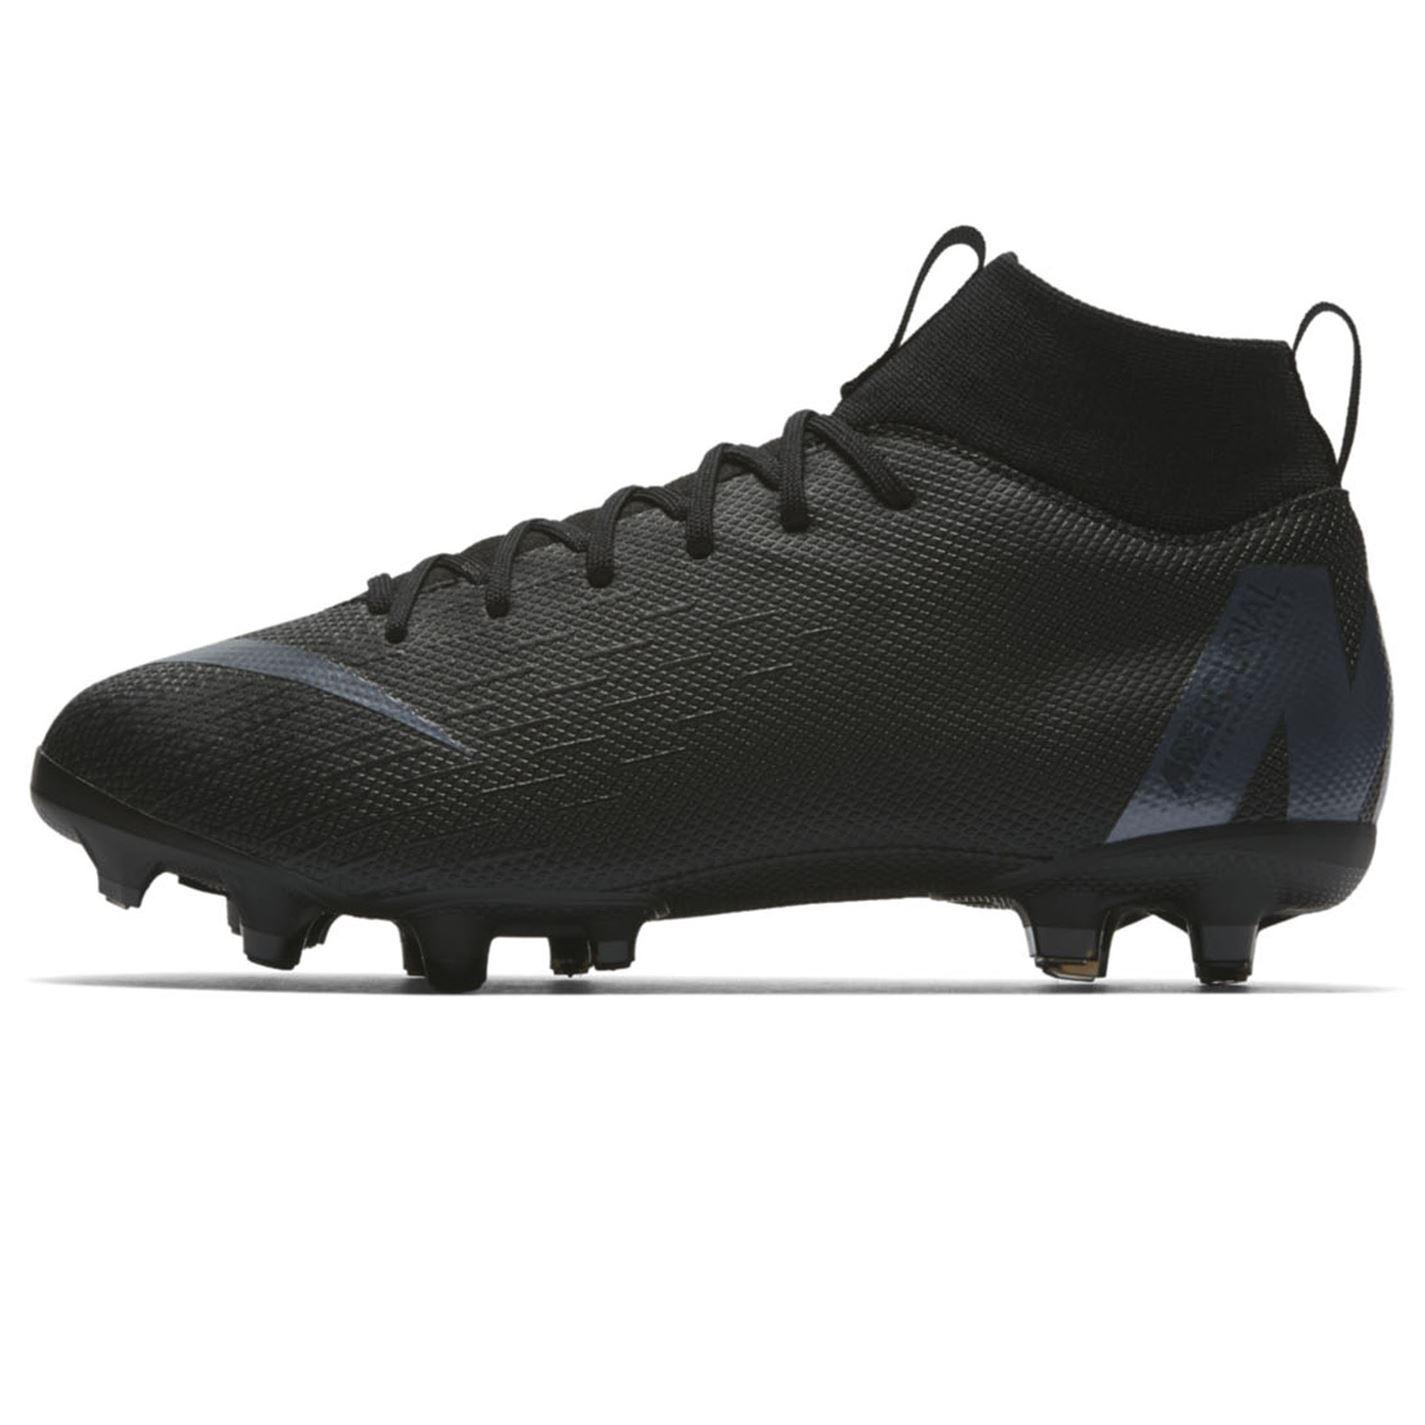 miniature 5 - Nike-Mercurial-Superfly-Academy-Terre-Ferme-Chaussures-De-Football-Juniors-Football-Crampons